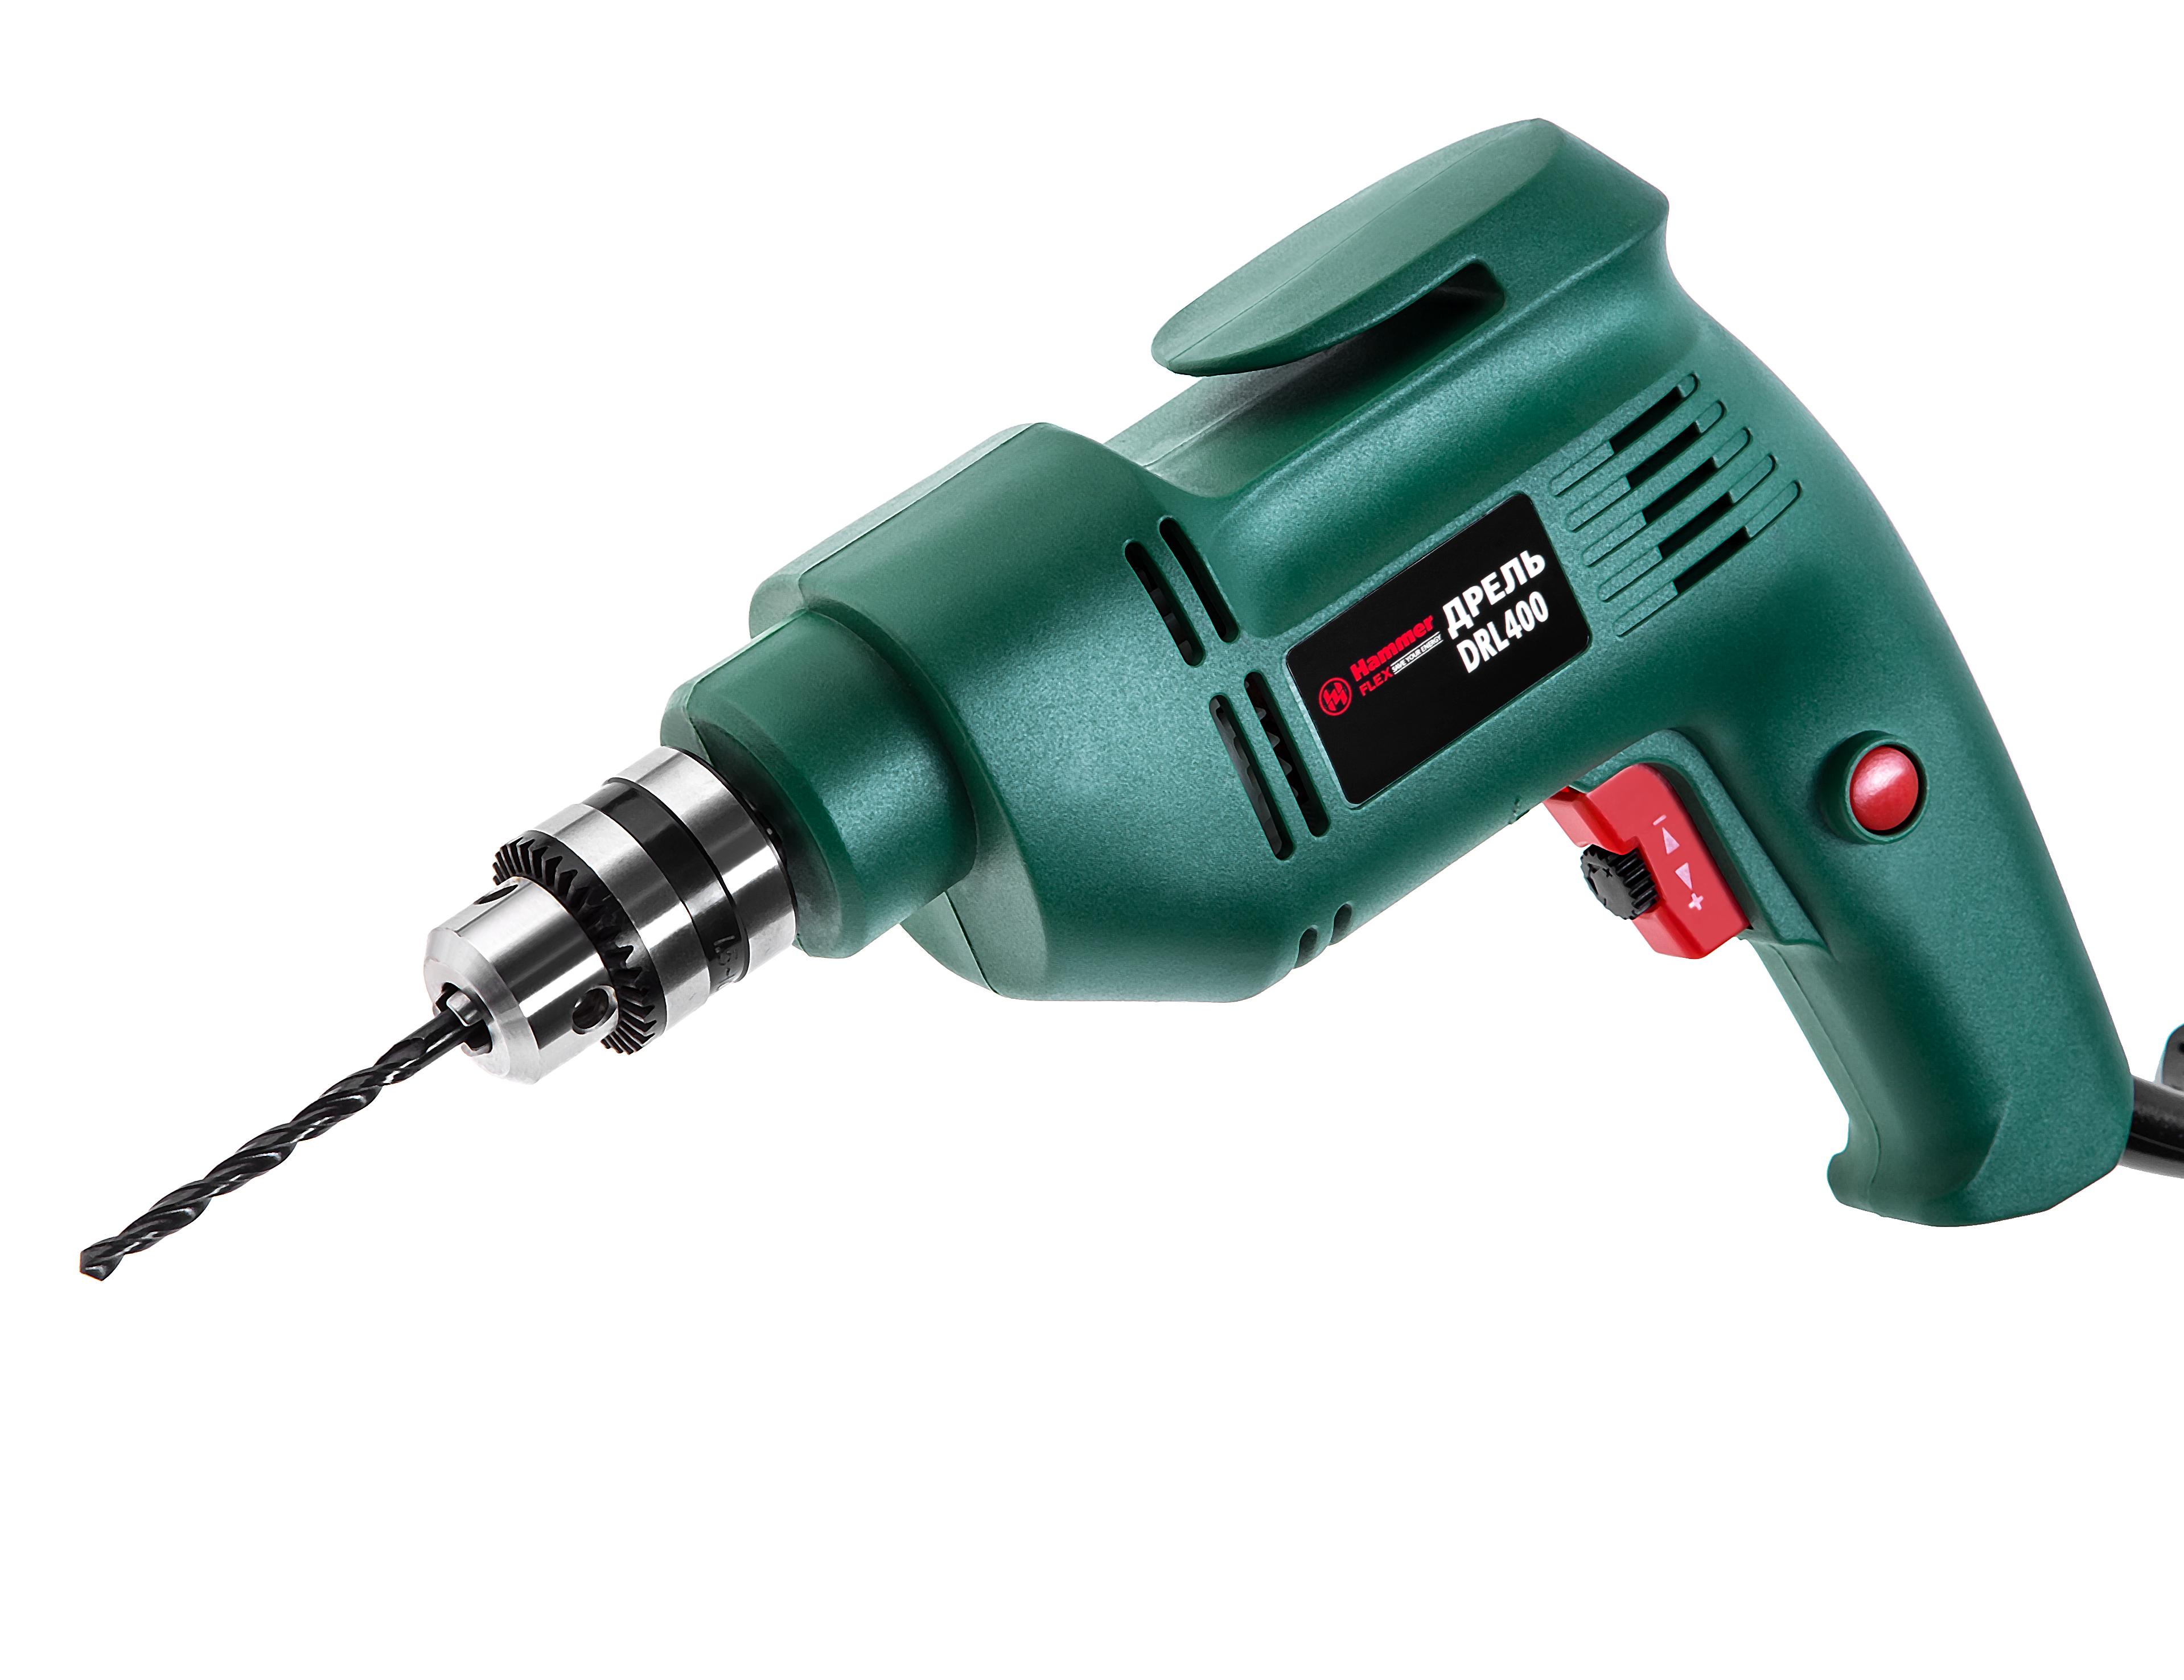 Дрель Hammer Flex drl400 дрель hammer flex drl400